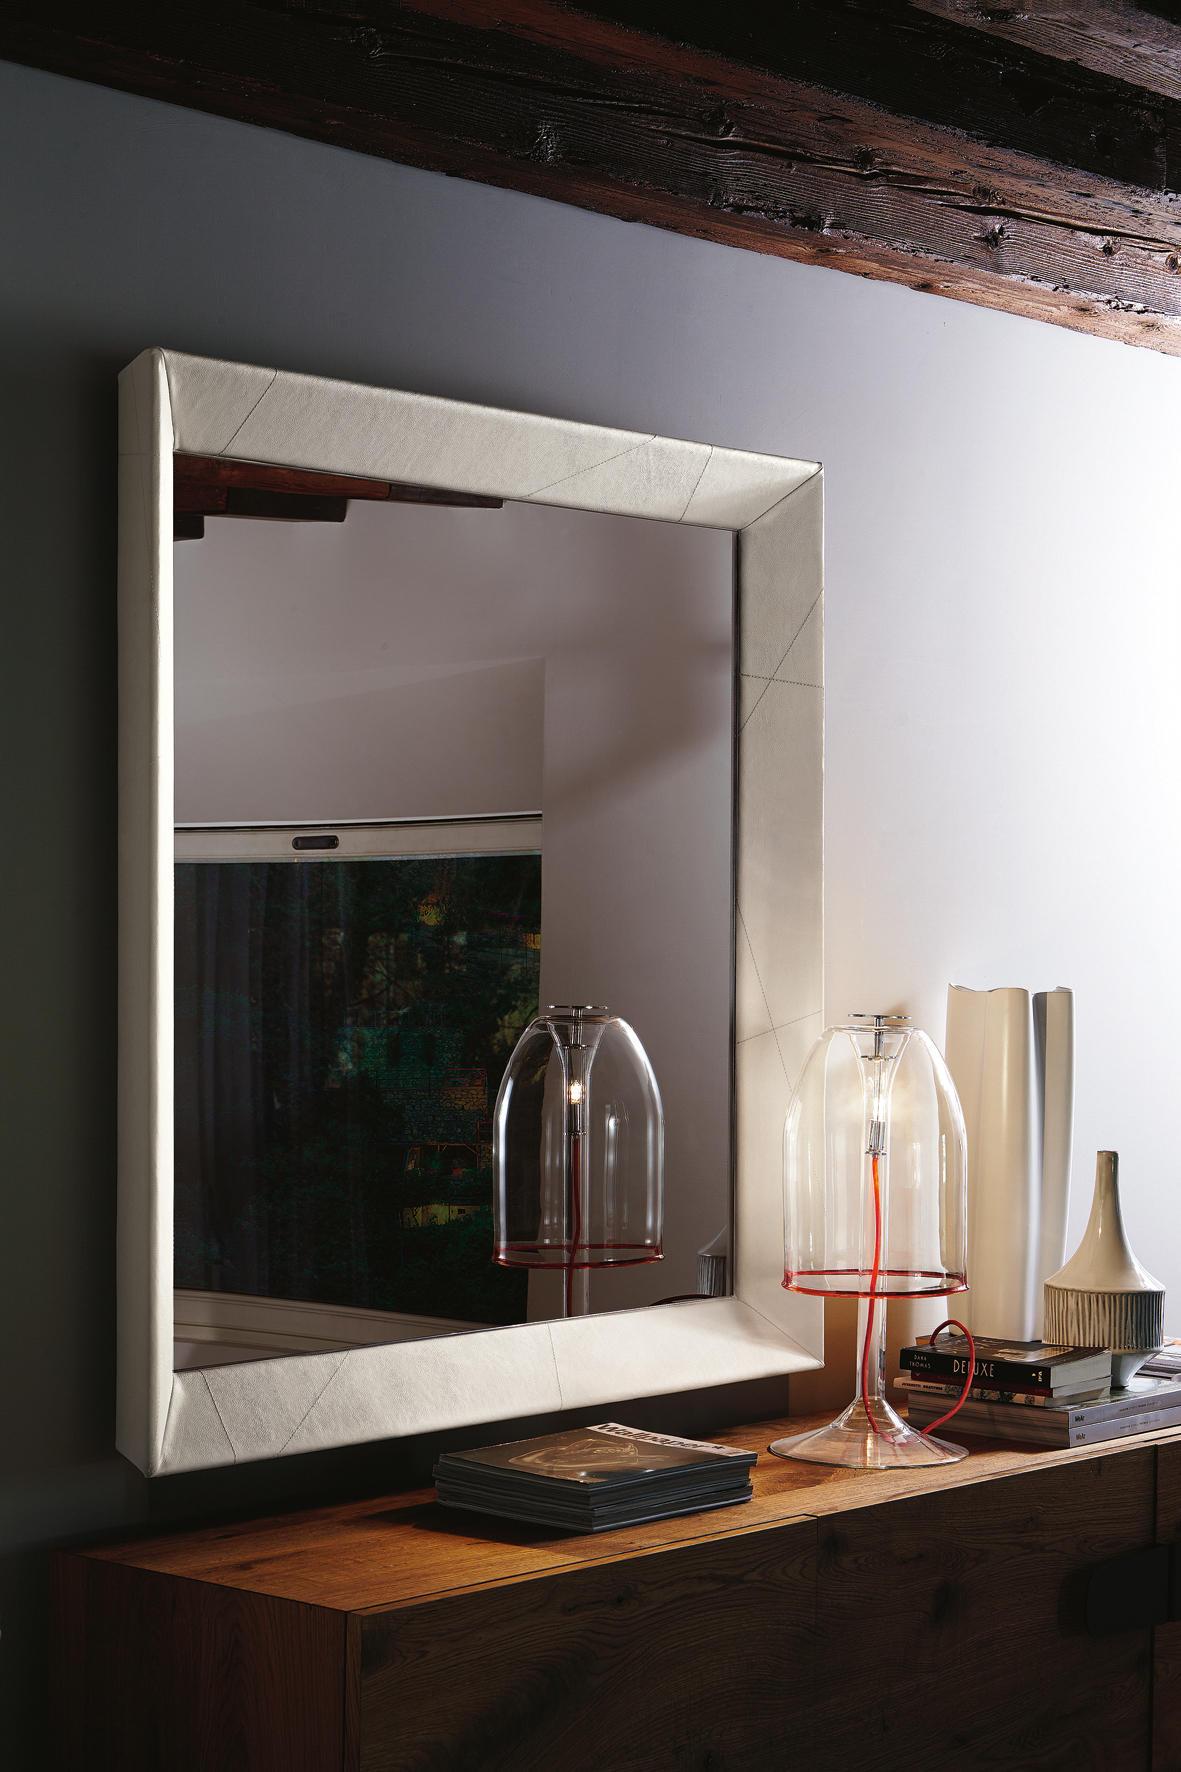 Taxedo Mirrors From Cattelan Italia Architonic # Muebles Di Giano